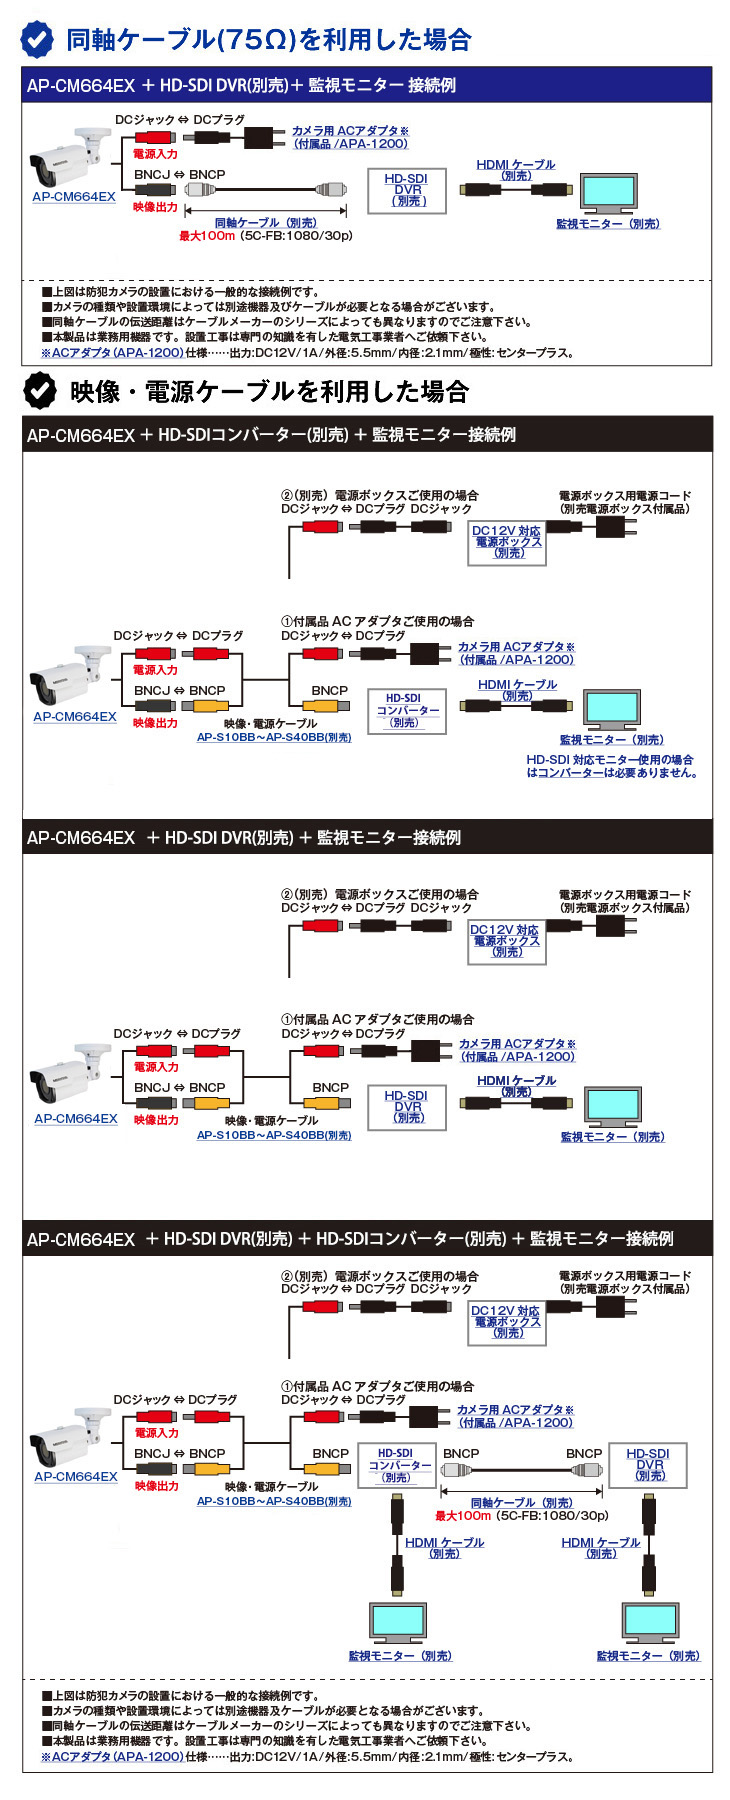 EX-SDI 514万画素防犯カメラ(AP-CM664EX)の接続イメージ